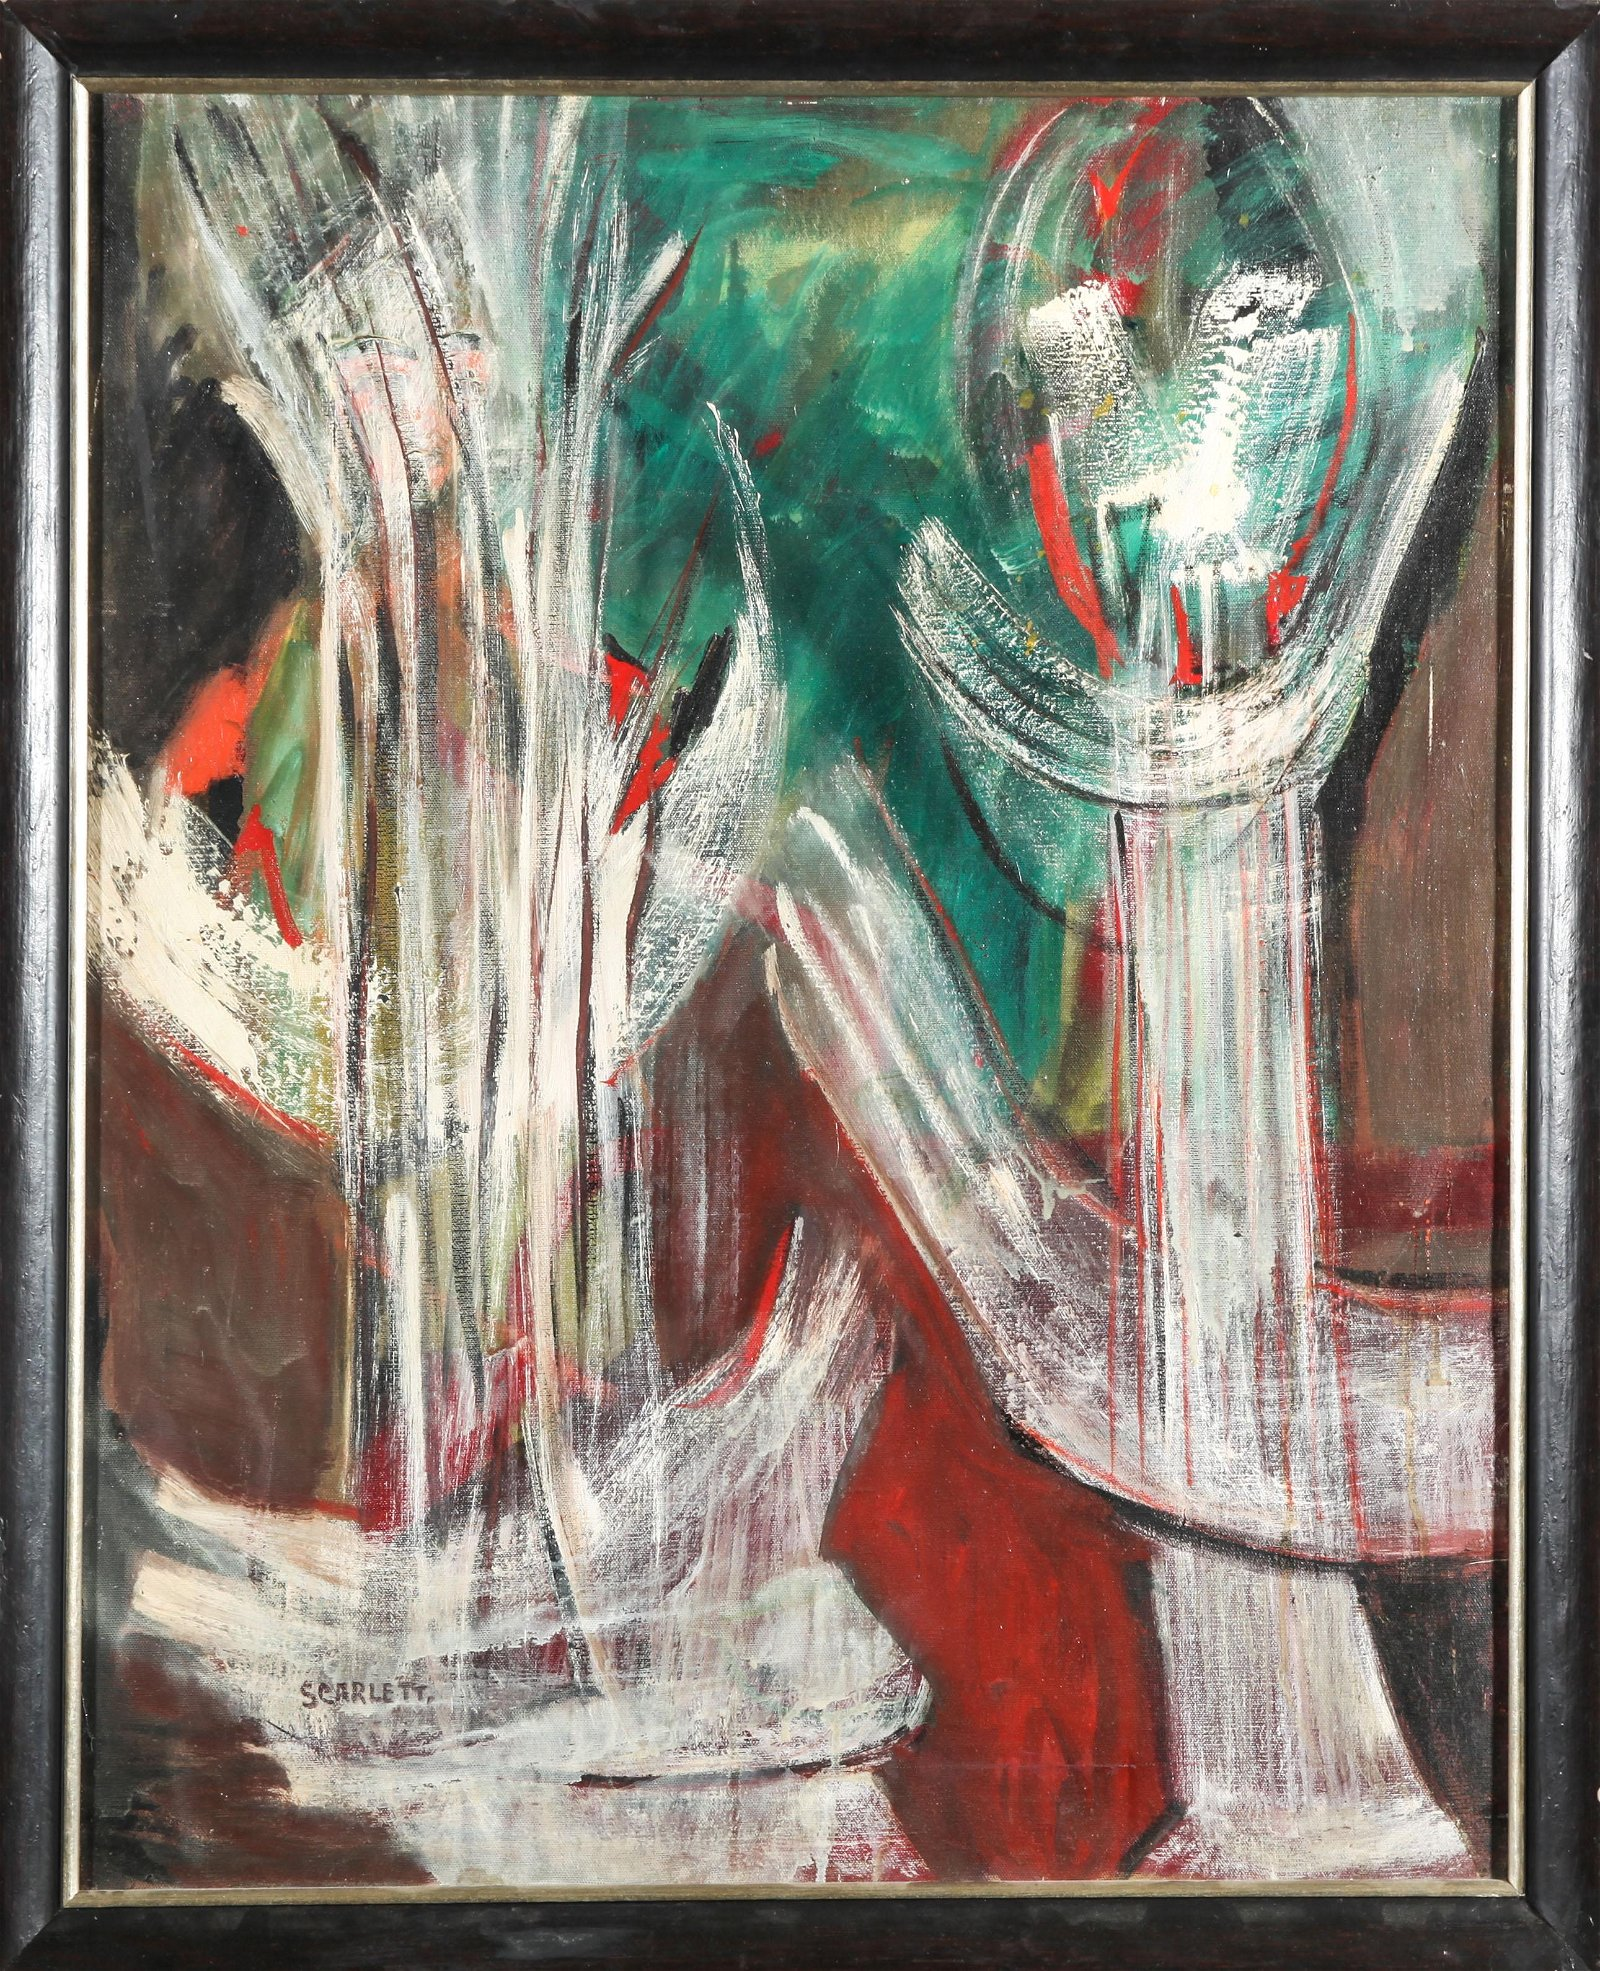 Rolph Scarlett Modern Abstract Oil on Canvas